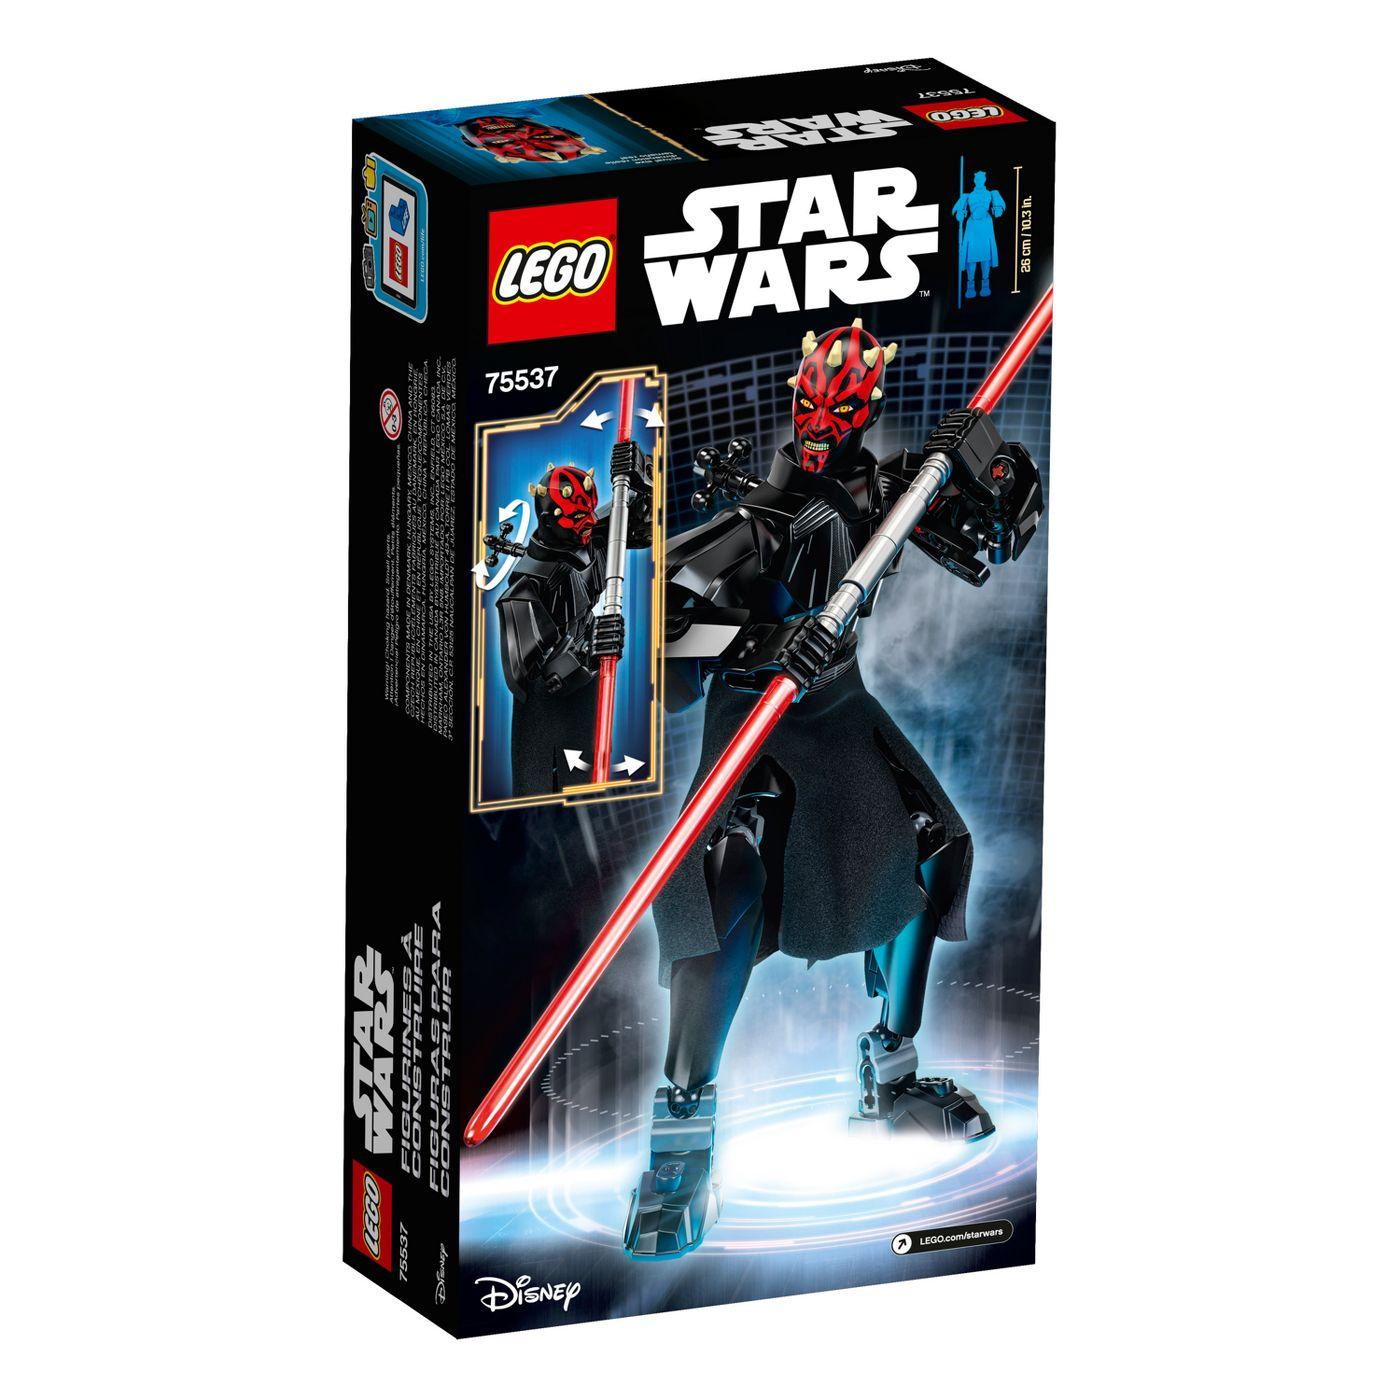 SW Darth Maul Buildable Figure Lego set 2